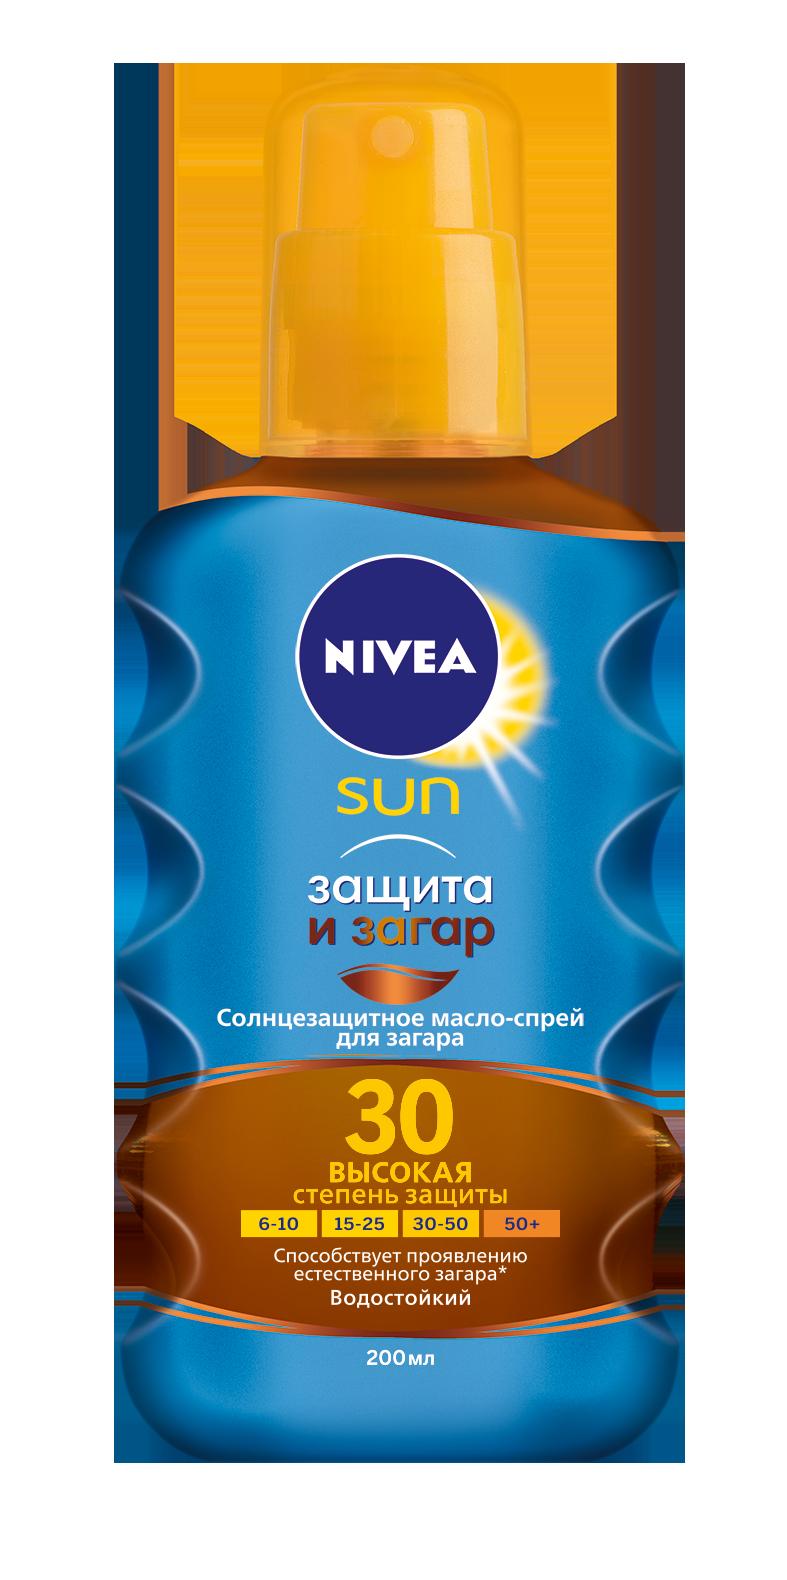 Нивея сан масло-спрей д/загара spf30 200мл (86038)